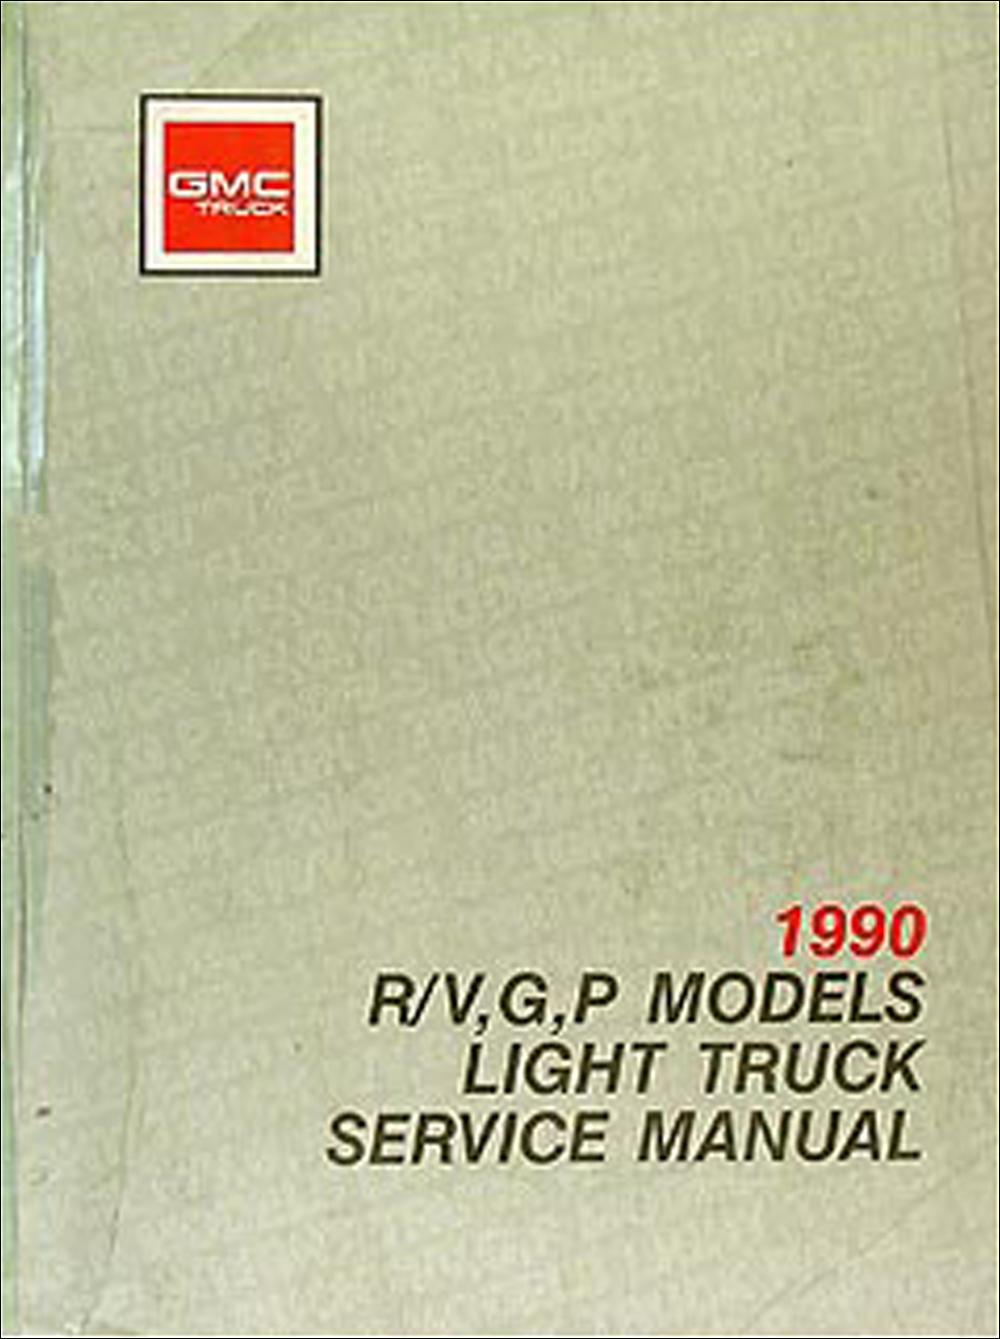 1985 Chevy Silverado 4x4 Truck On 79 Chevy K5 Blazer Wiring Diagrams